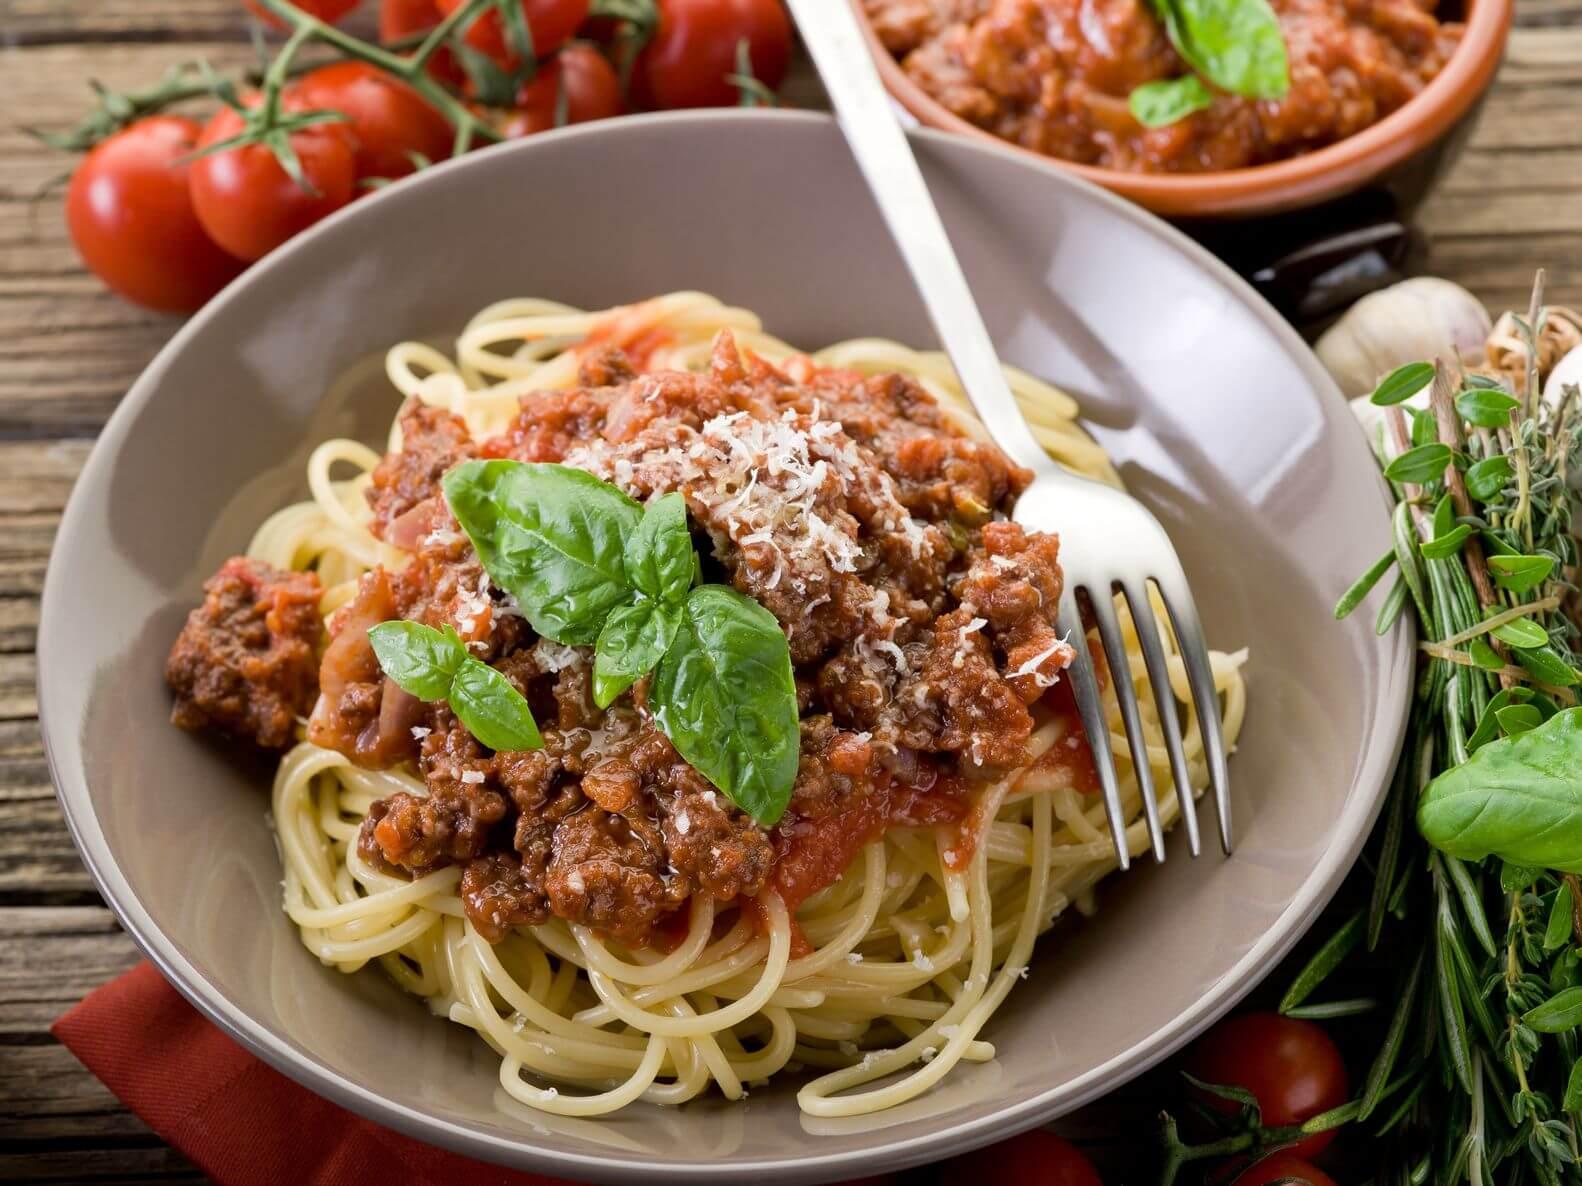 Meatless lover's ragu spaghetti sauce